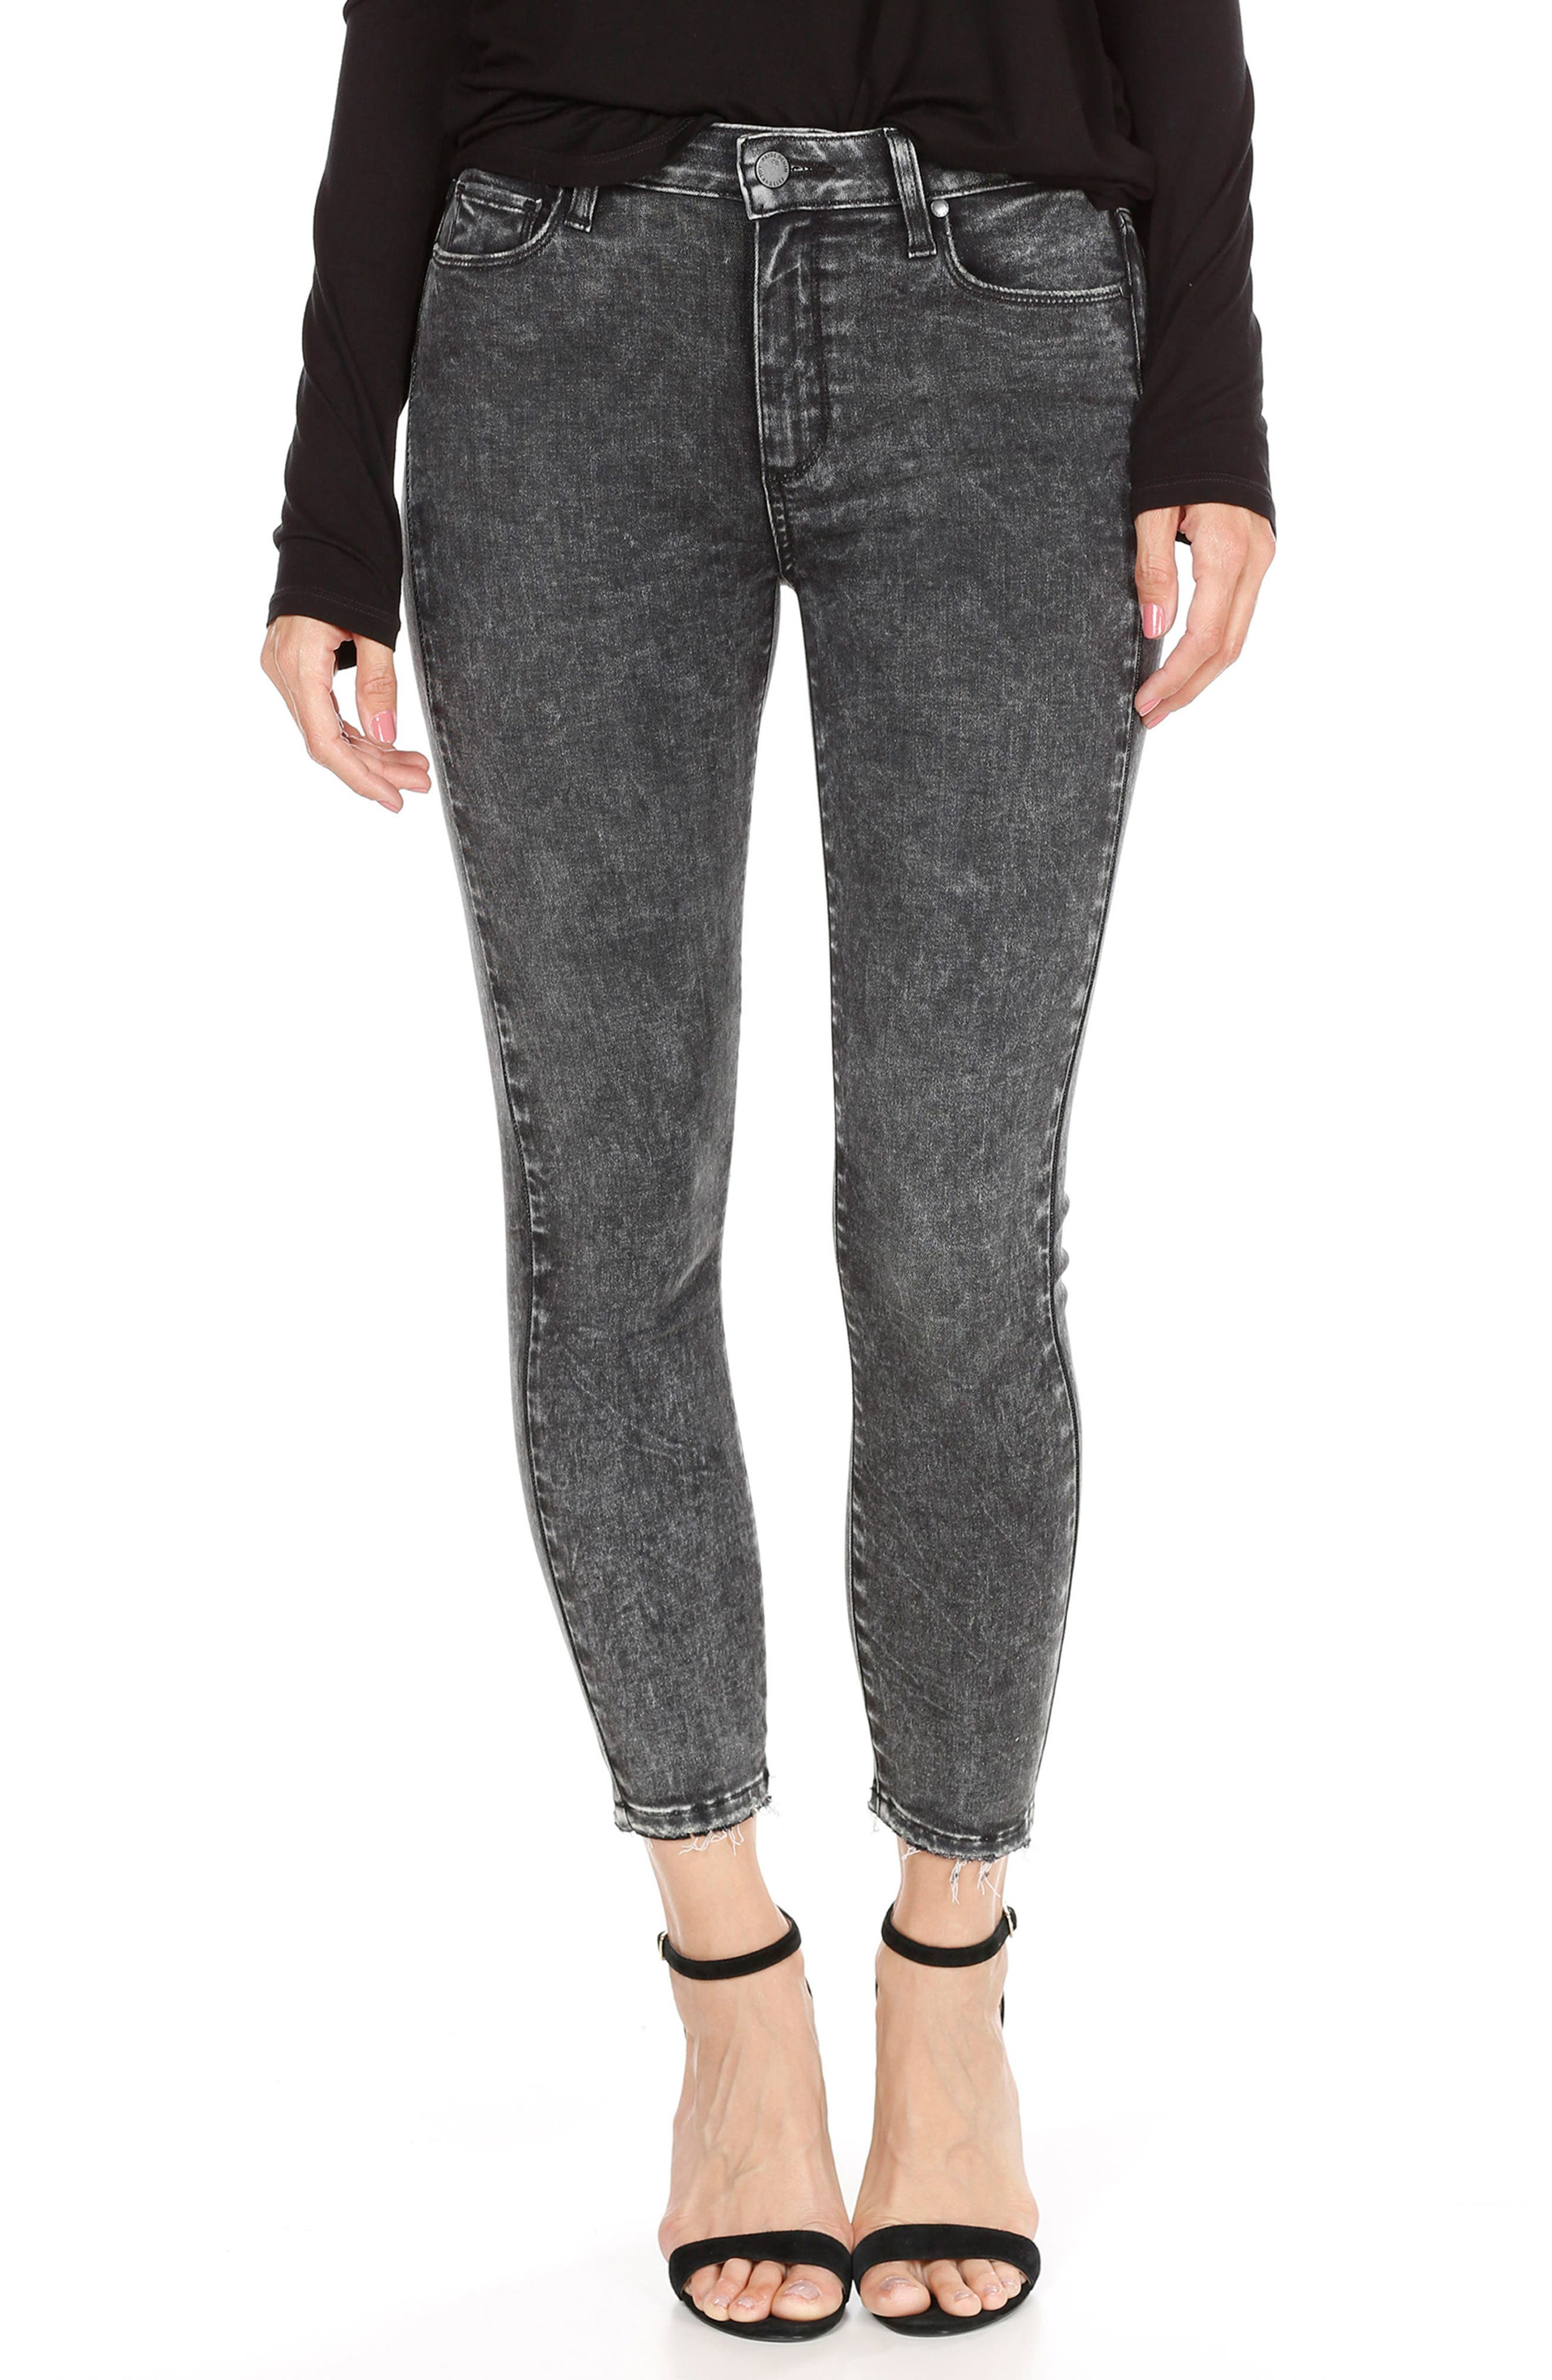 Hoxton High Waist Crop Skinny Jeans,                             Main thumbnail 1, color,                             021